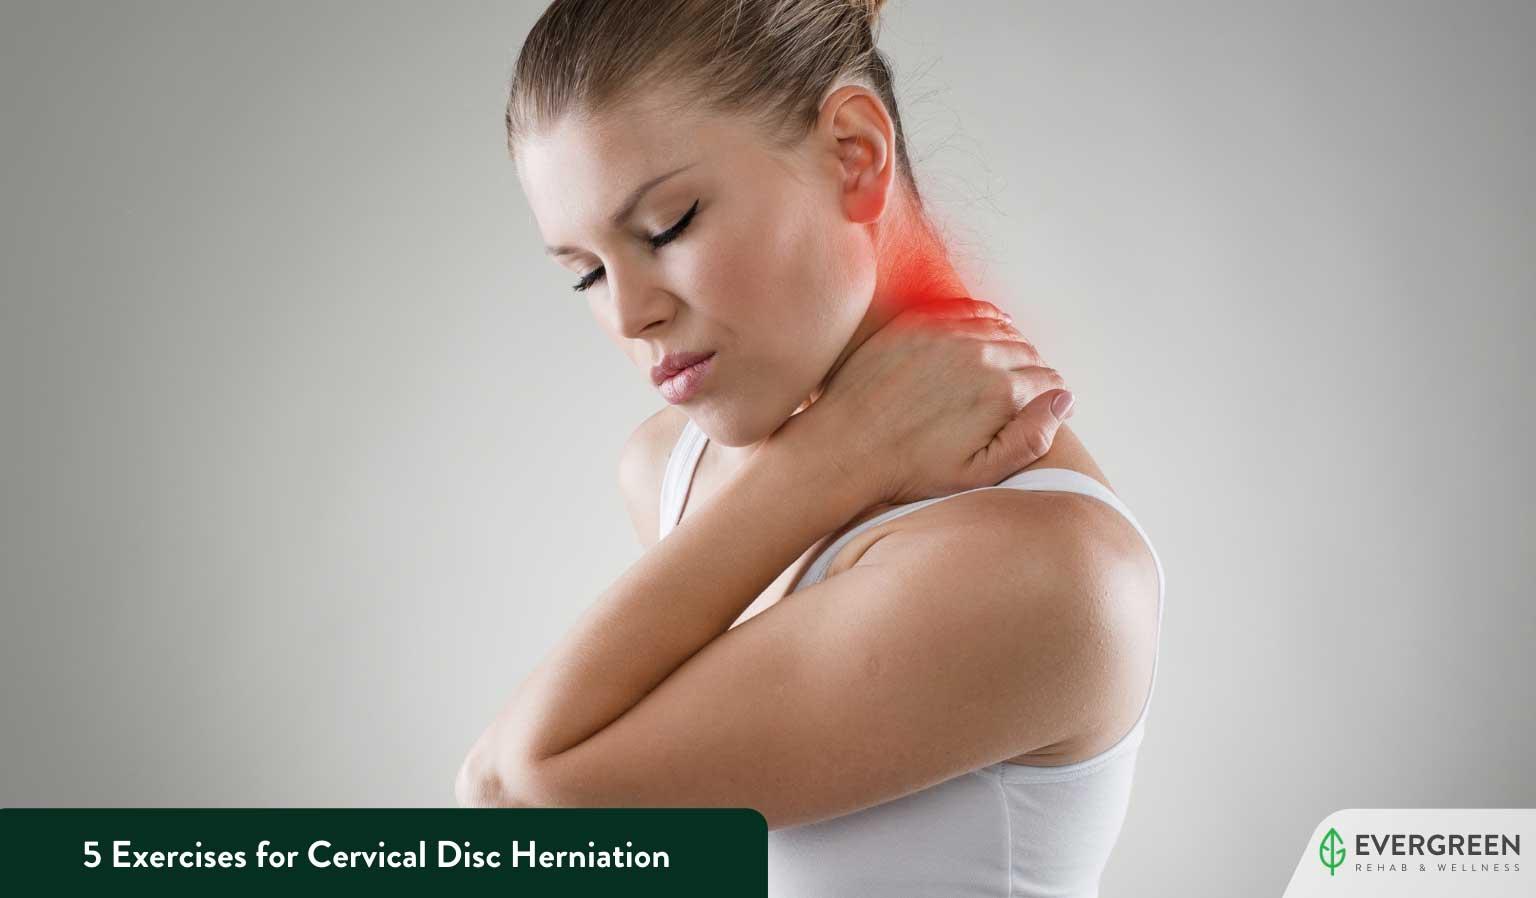 5 Exercises for Cervical Disc Herniation